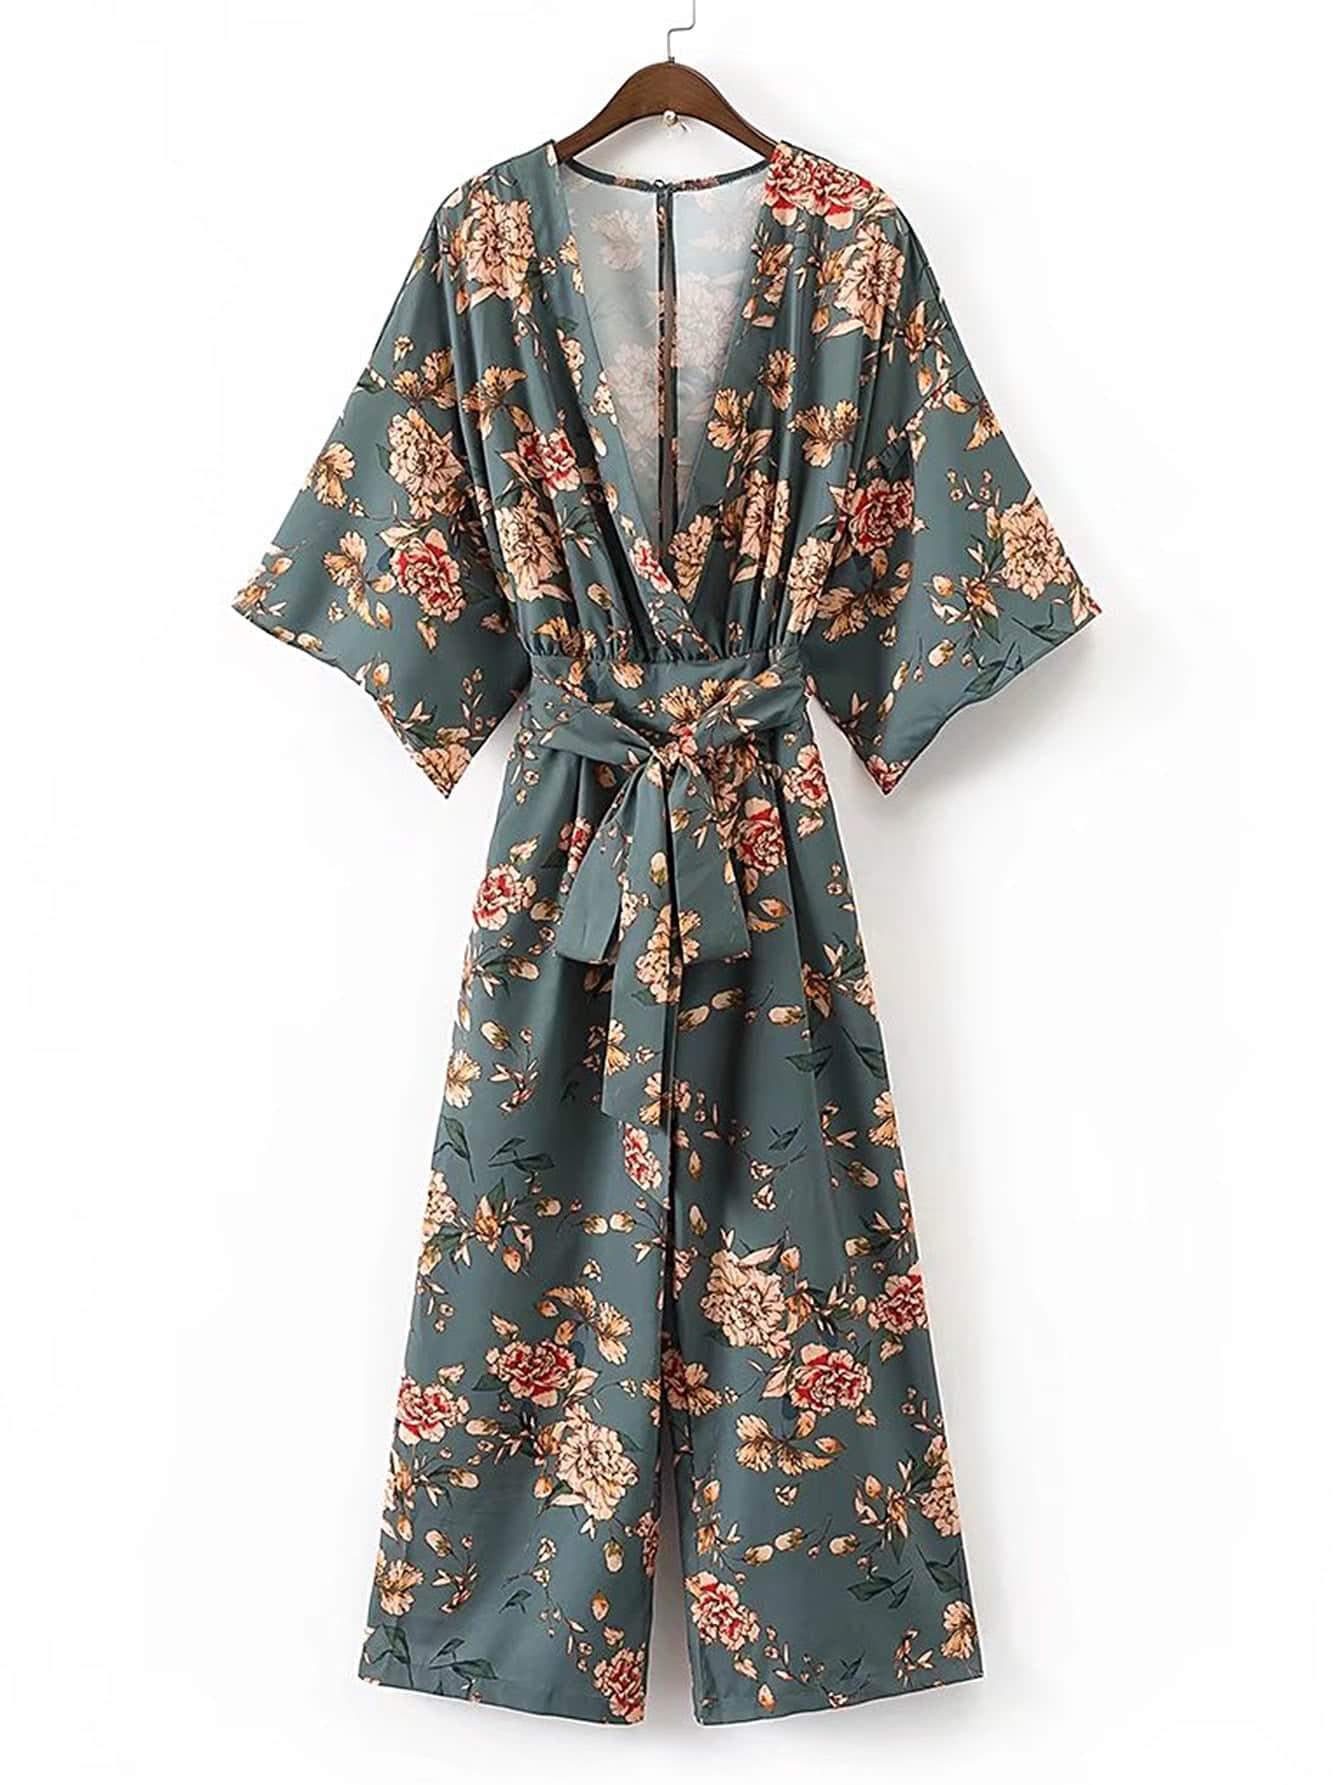 Plunging V-Neckline Floral Print Tie Waist Jumpsuit